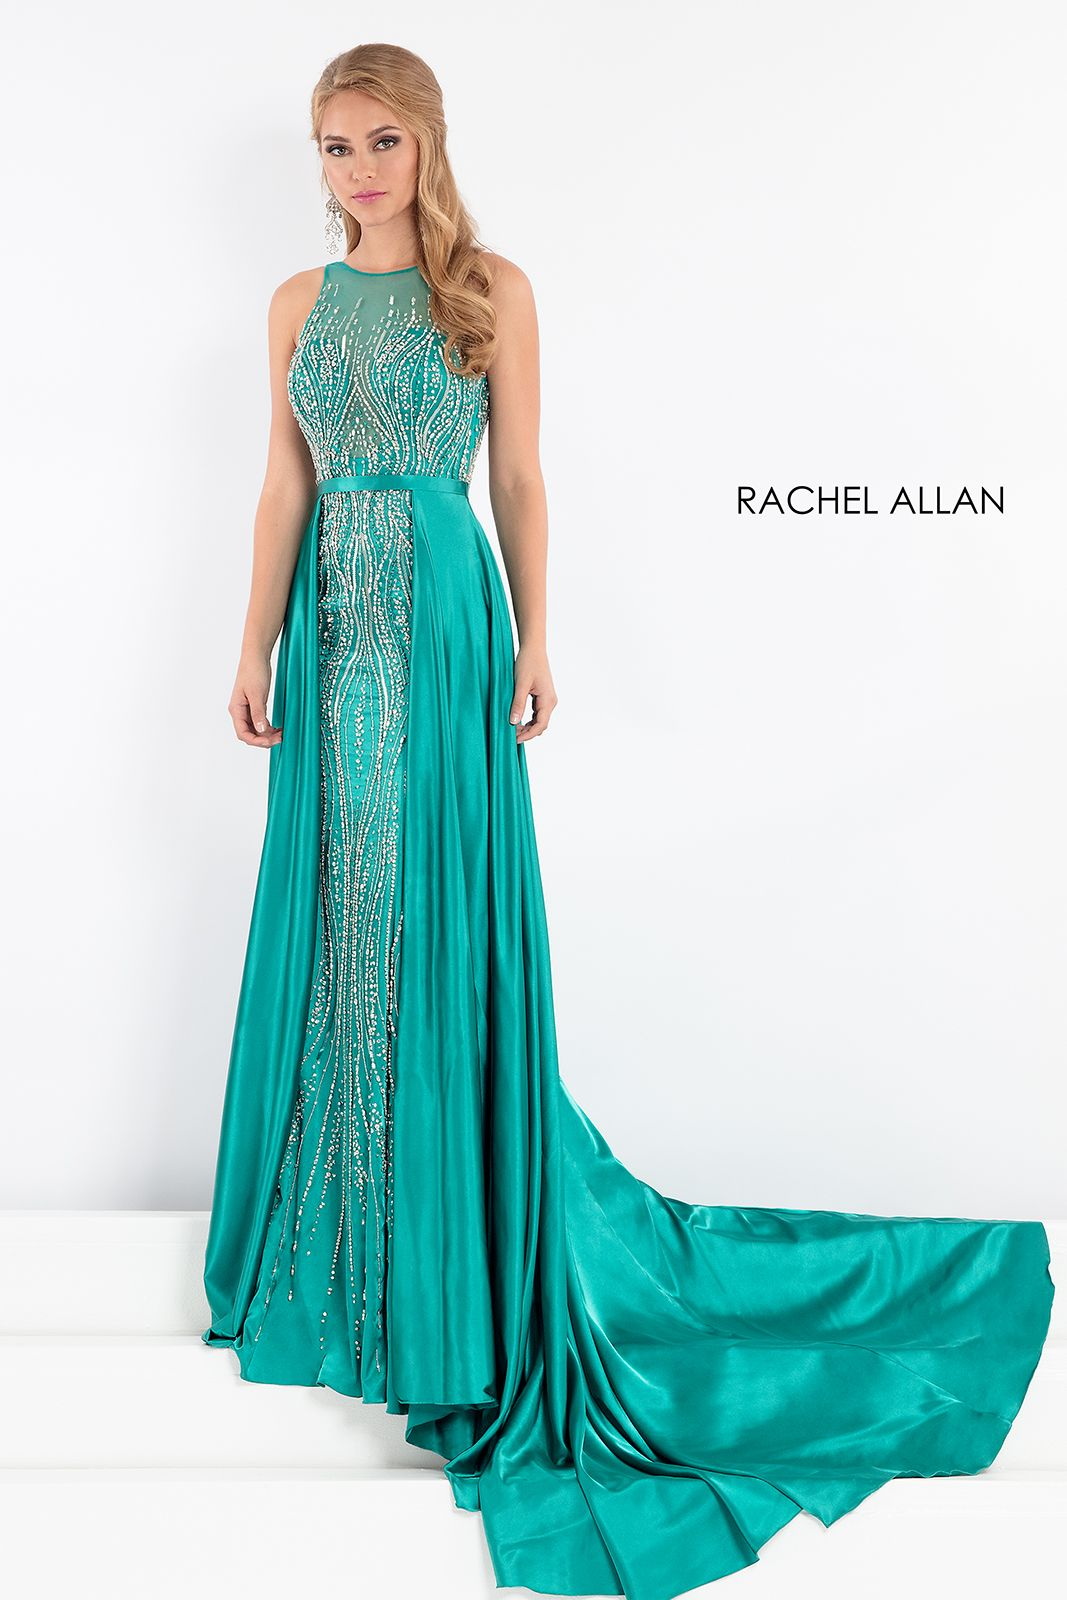 Pin by marissa krashefski on clothing pinterest pageants